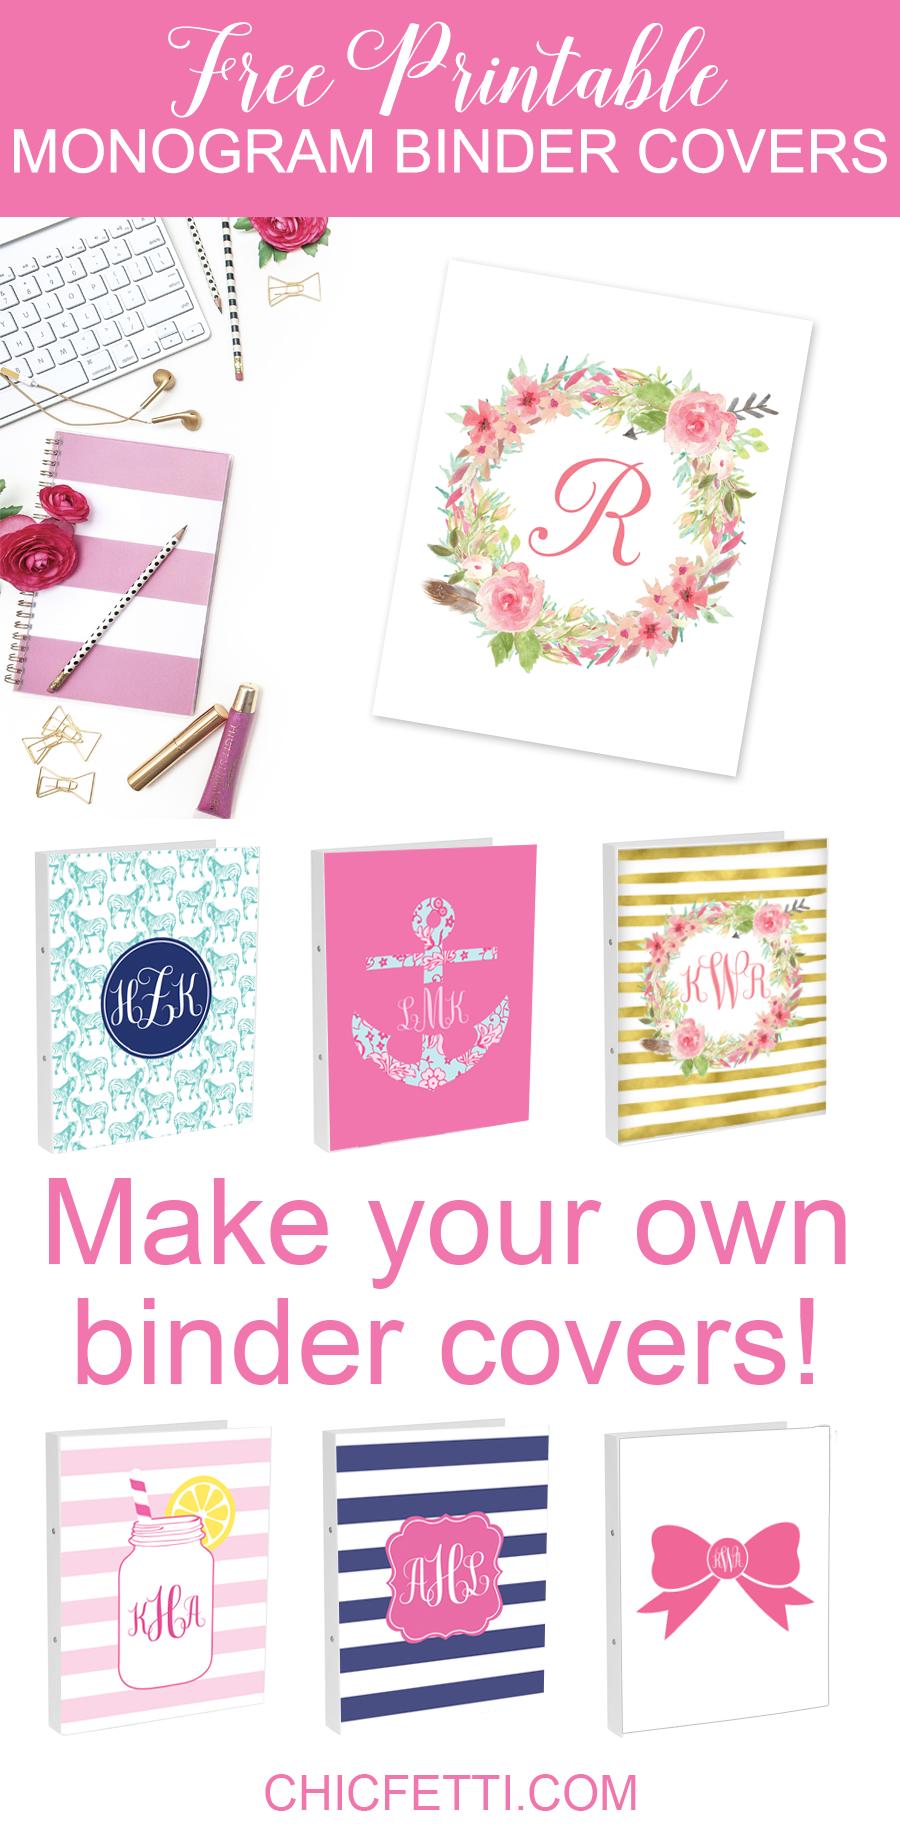 Diy Monogram Binder Covers Using Free Monogram Maker - Chicfetti Blog - Free Printable Customizable Binder Covers